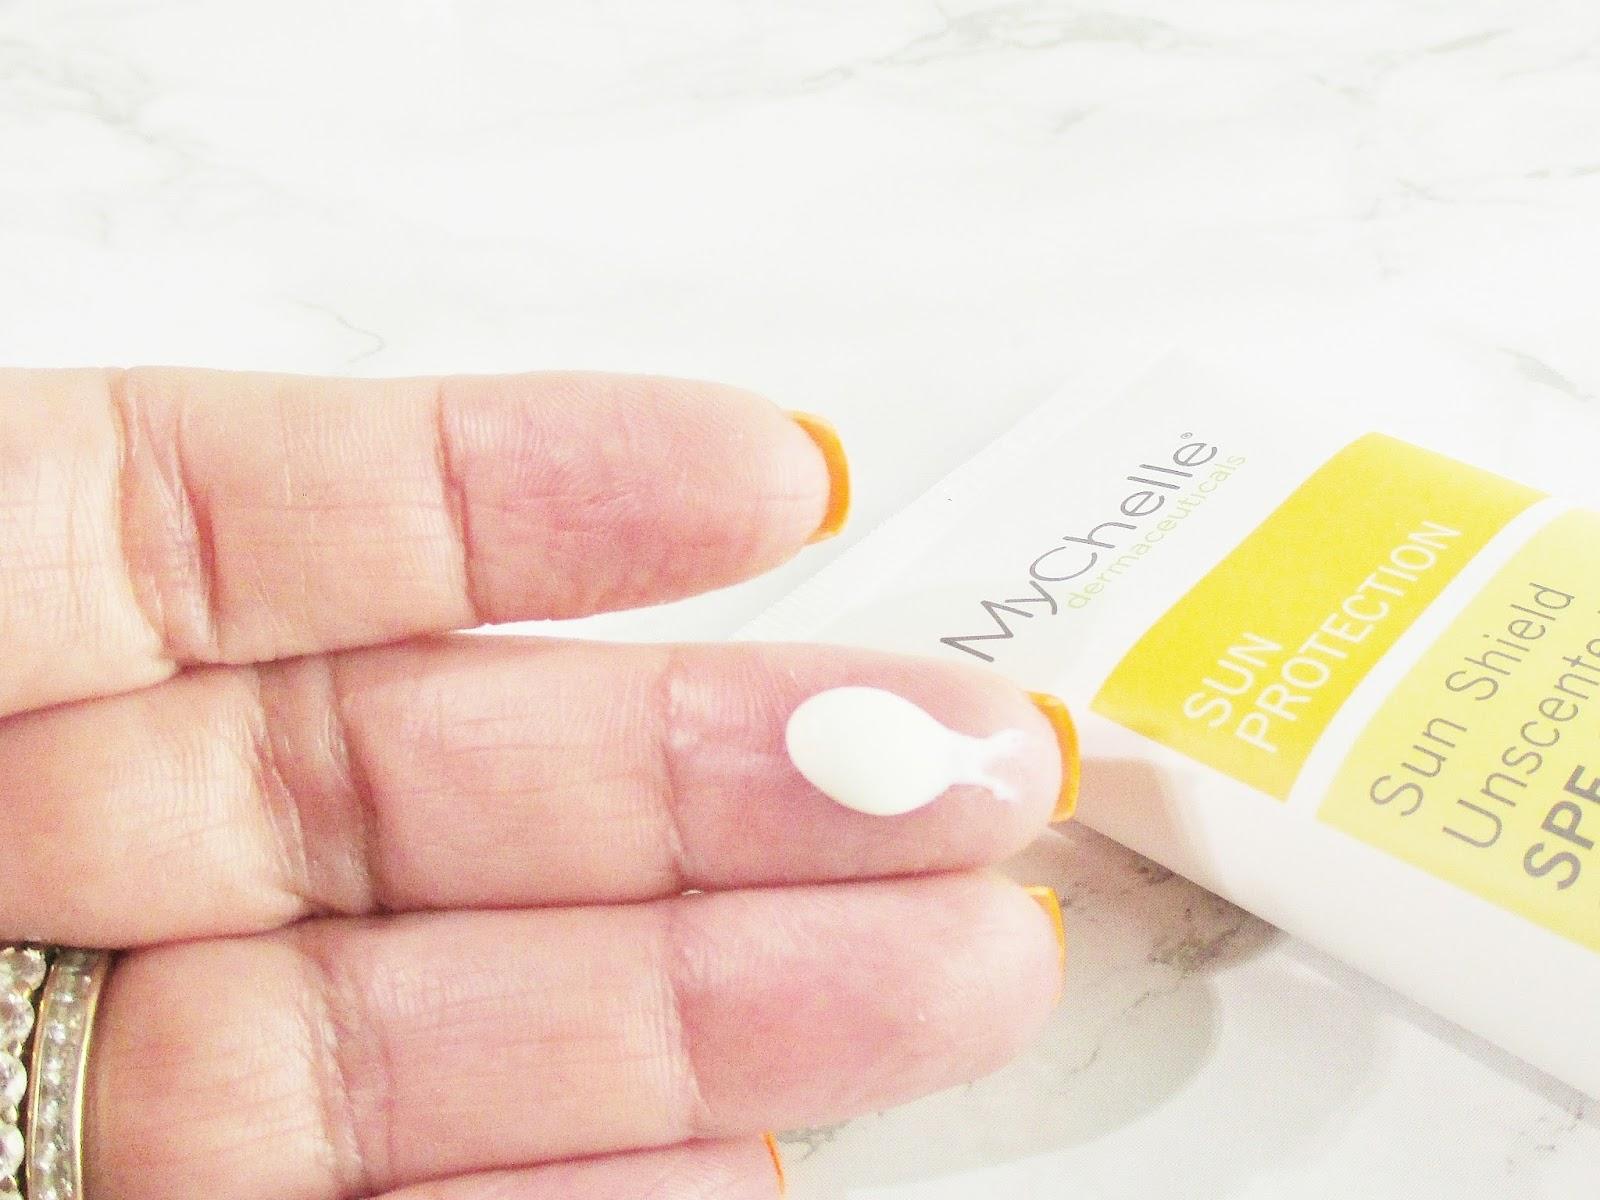 mychelle-dermaceuticals-skin-care-solar-shield-spf-28-dollop